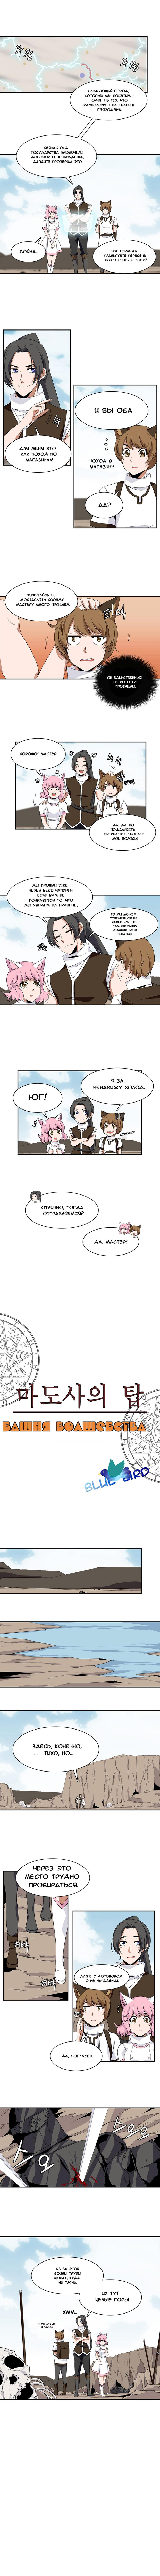 https://r1.ninemanga.com/comics/pic2/48/28784/301760/1462867590424.jpg Page 1